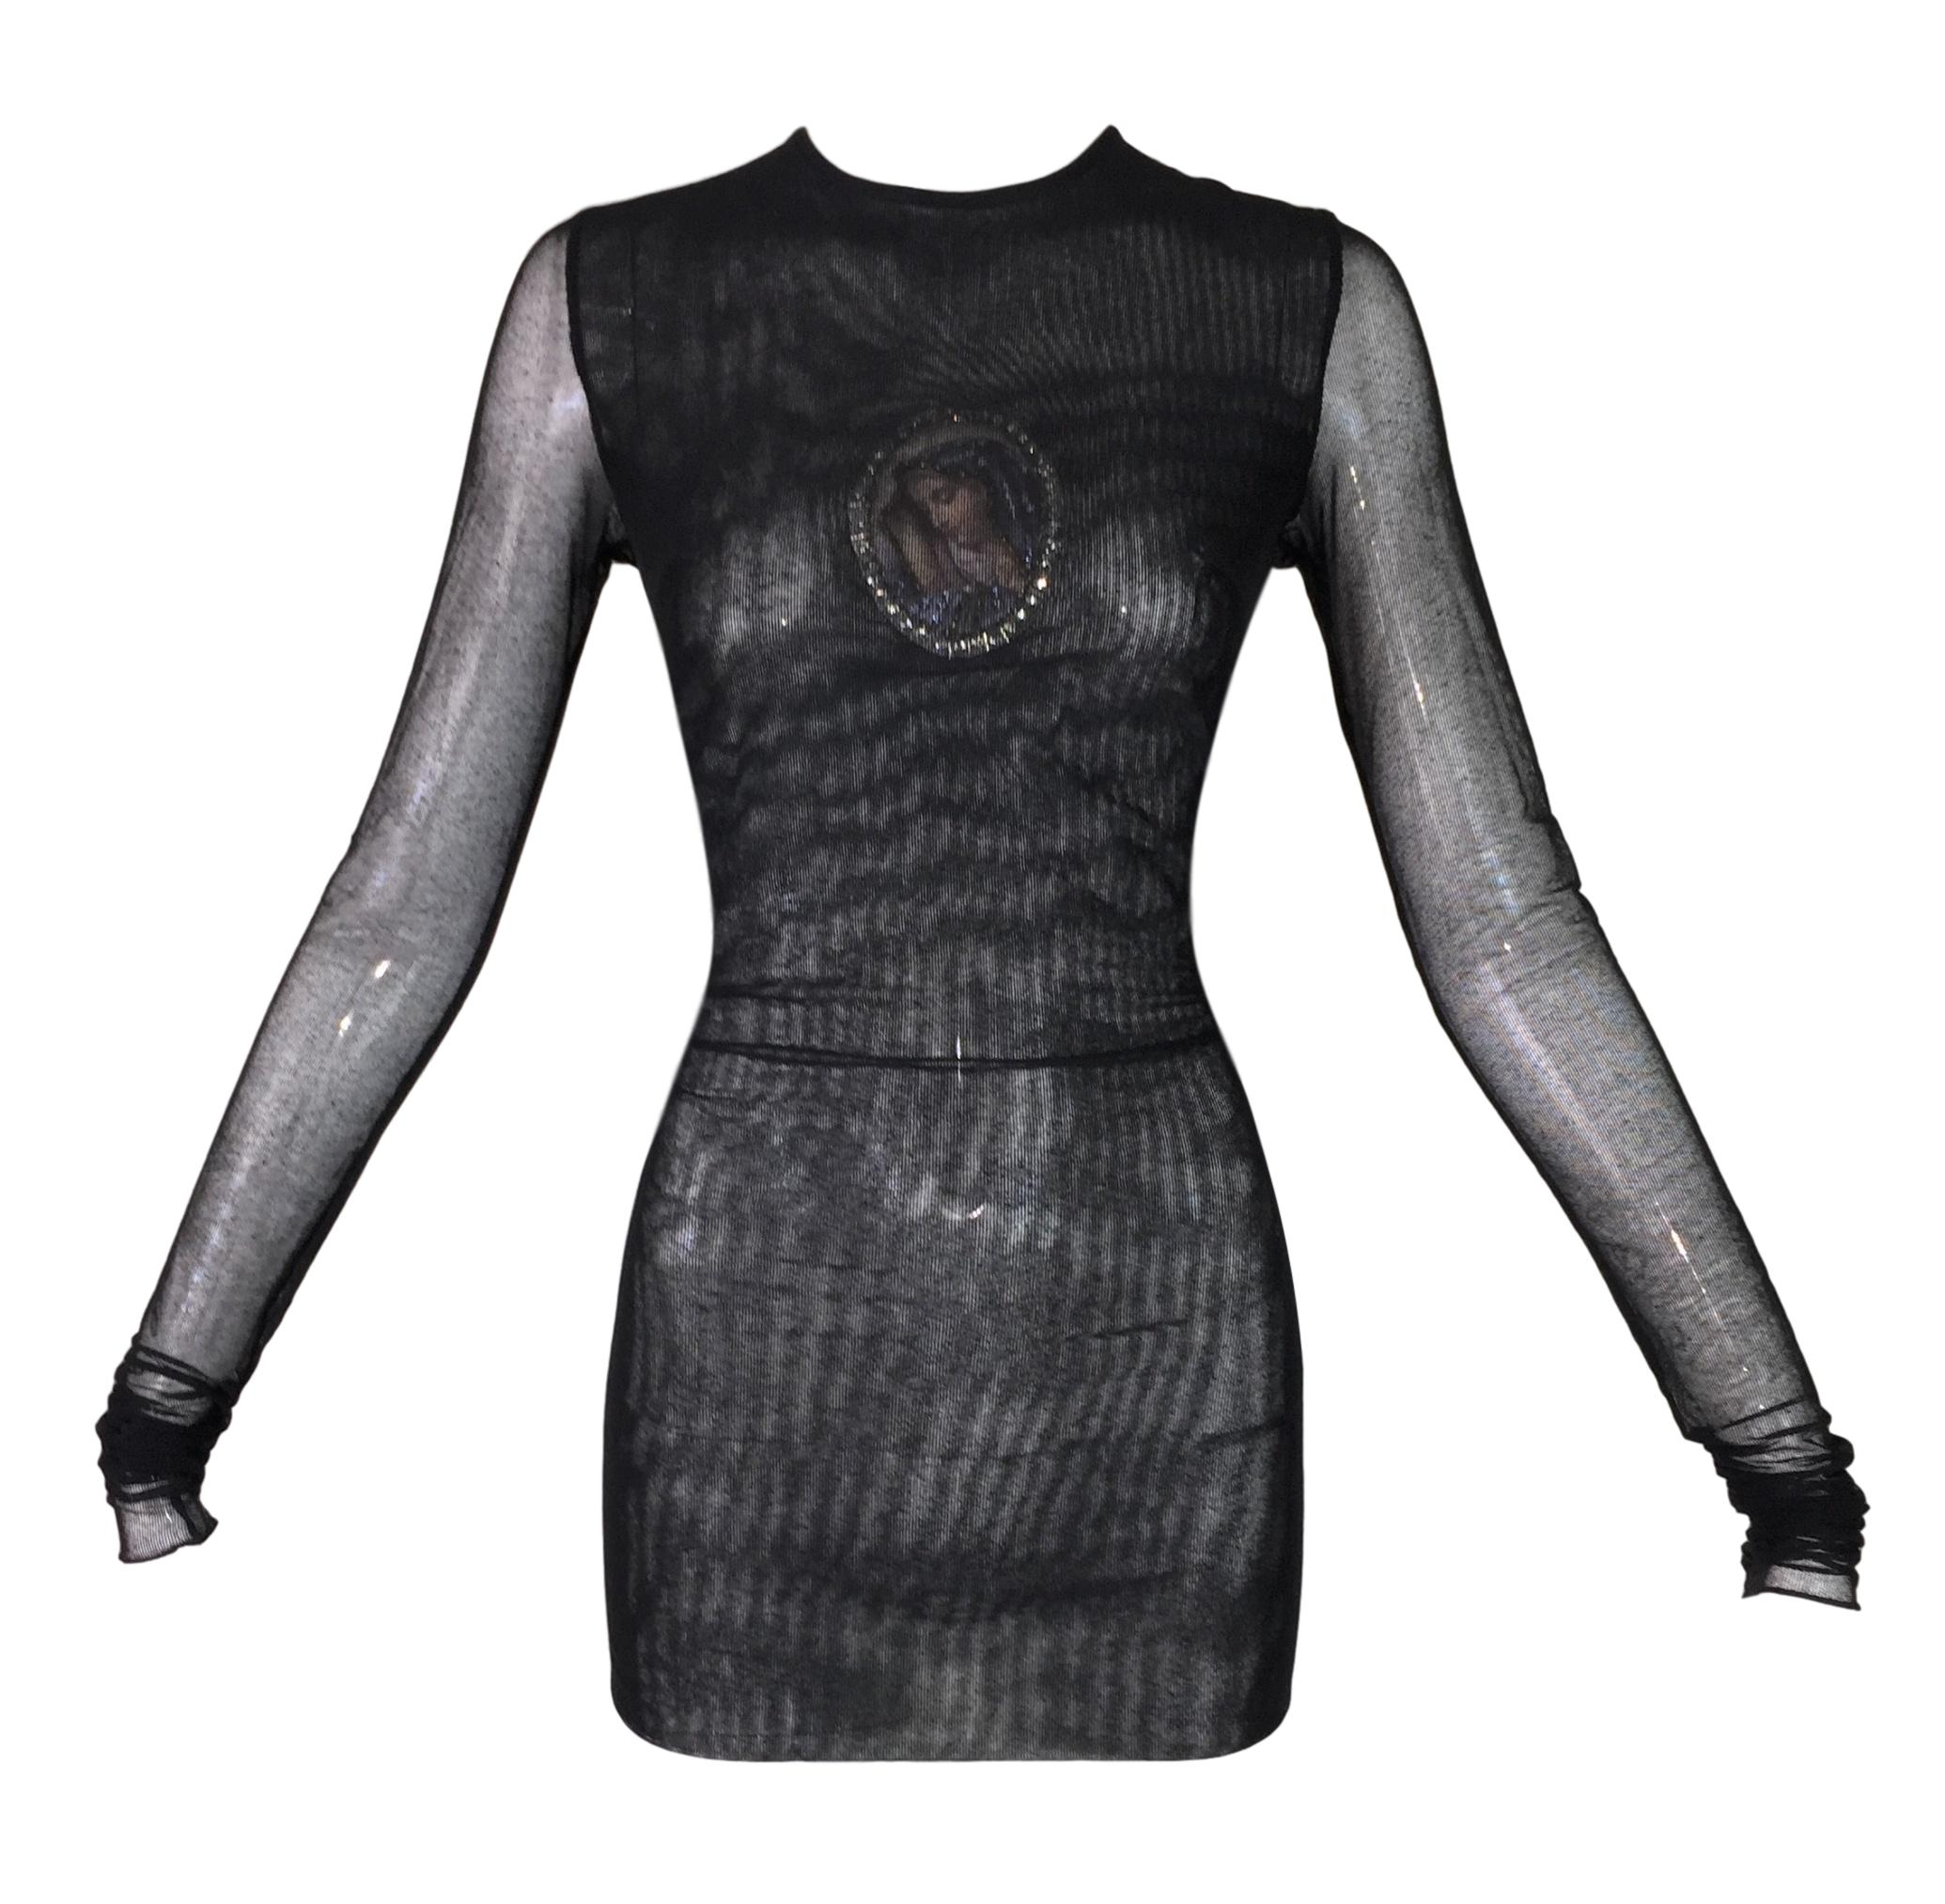 1998 Dolce & Gabbana Sheer Black Mesh Madonna Embellished L/S Tunic Top